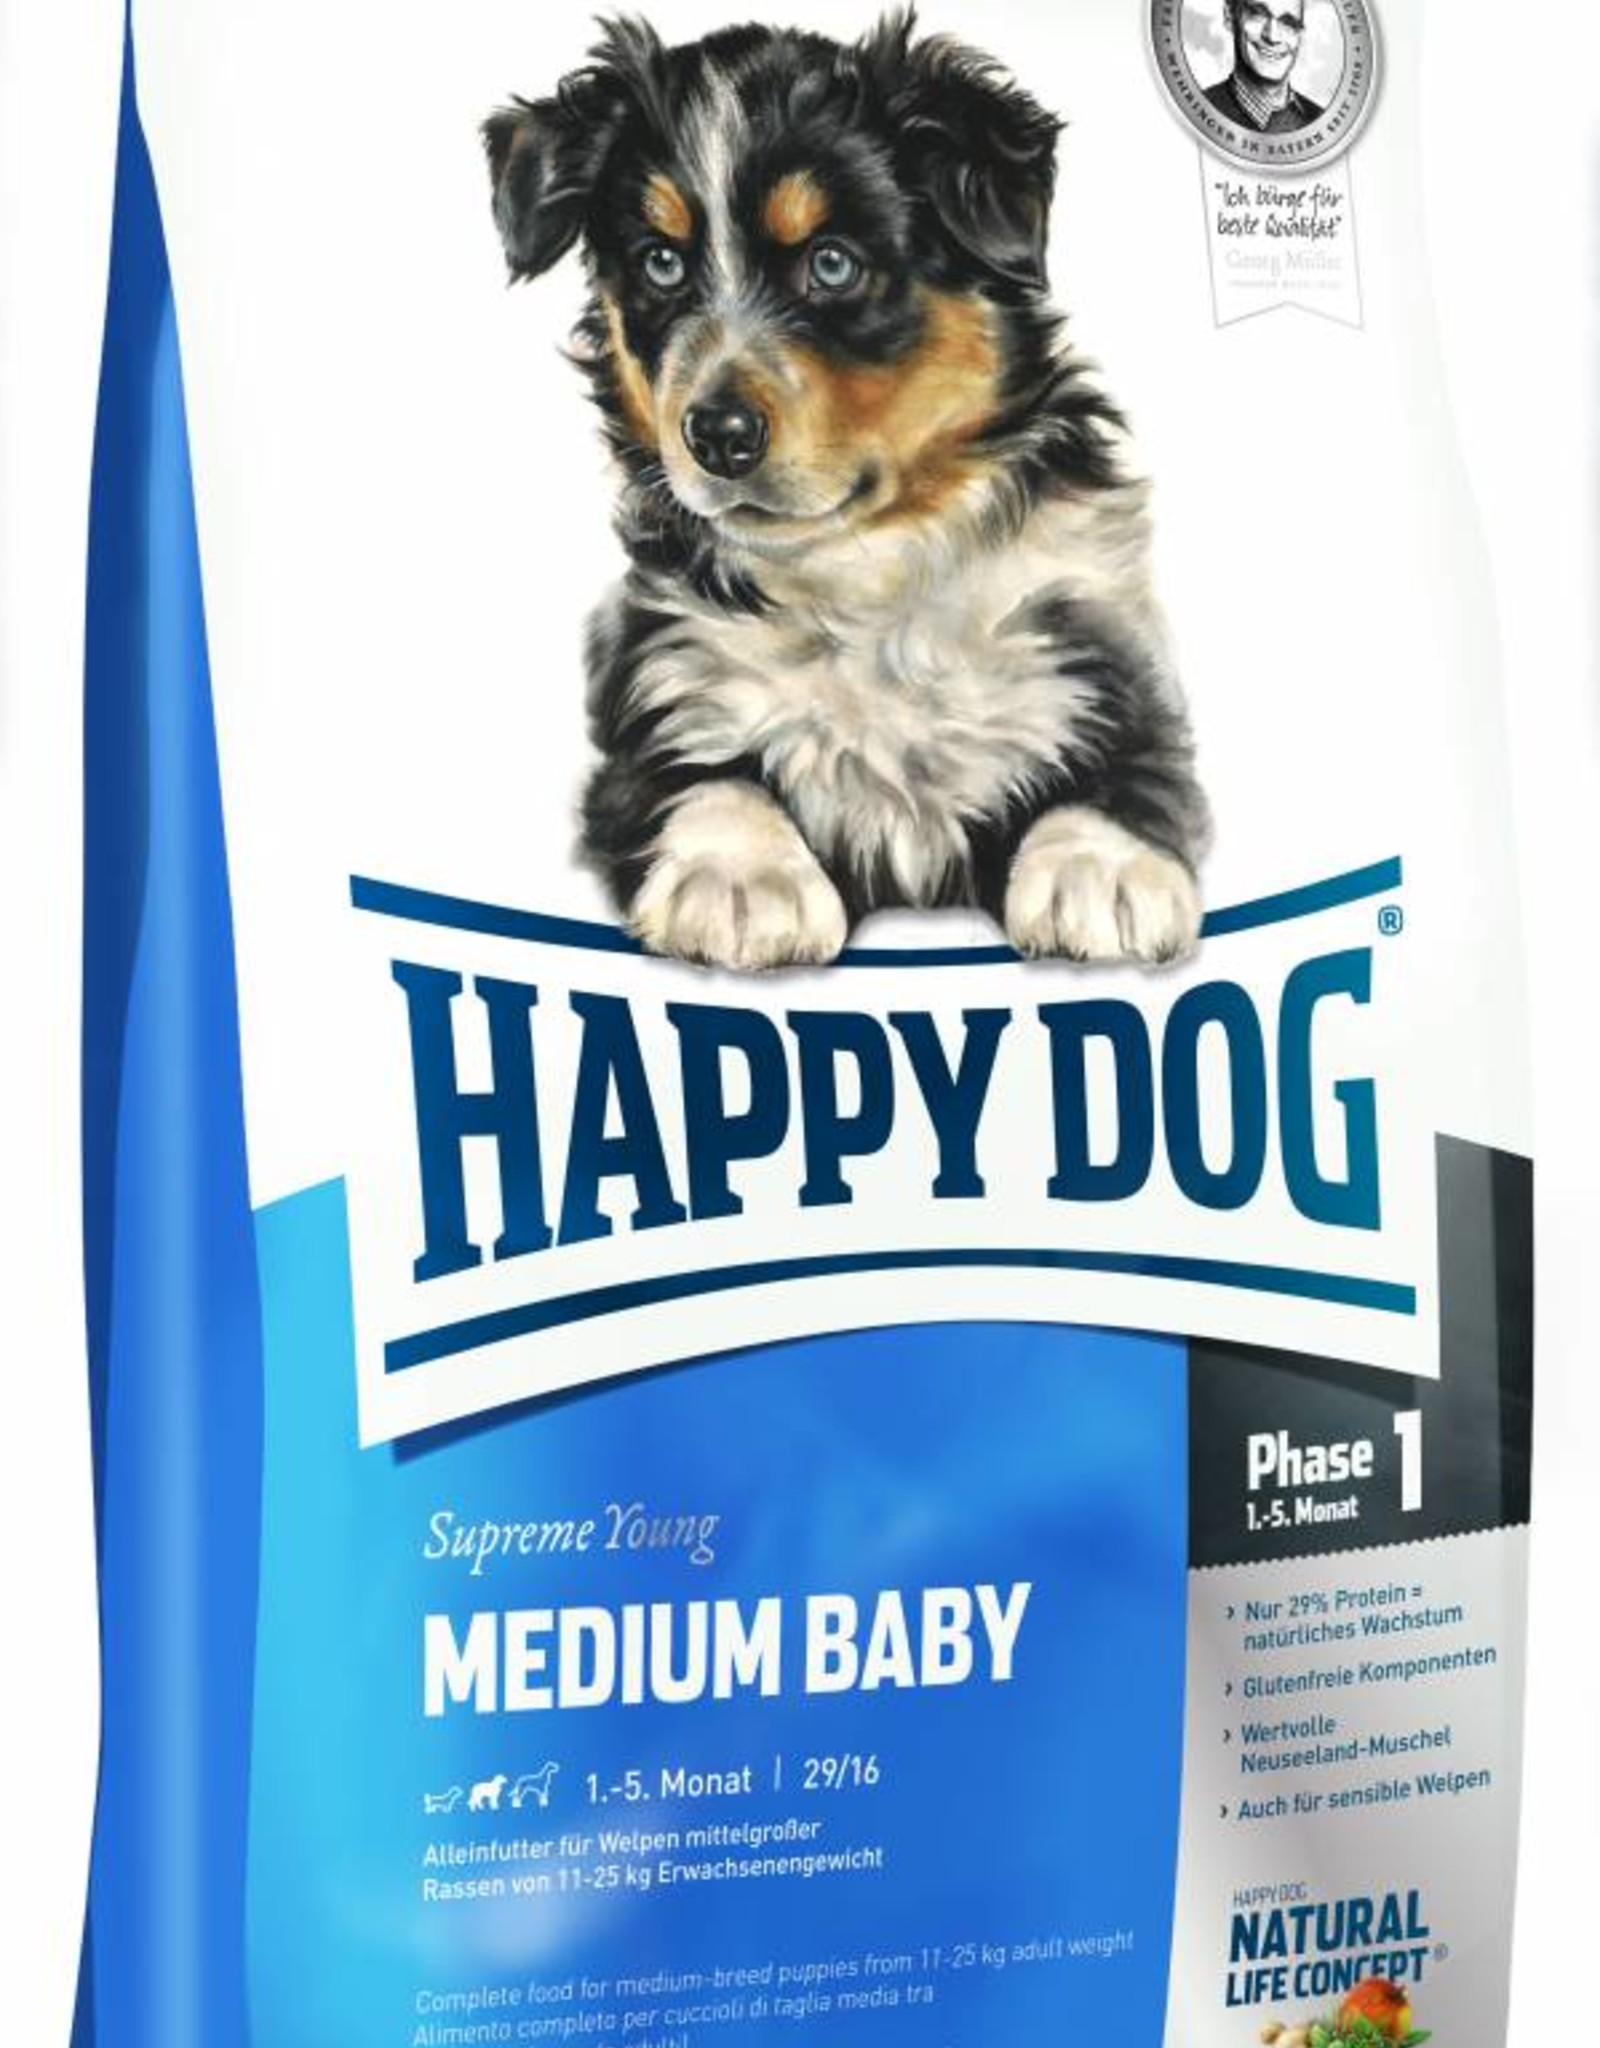 Happy Dog Supreme Young Medium Baby